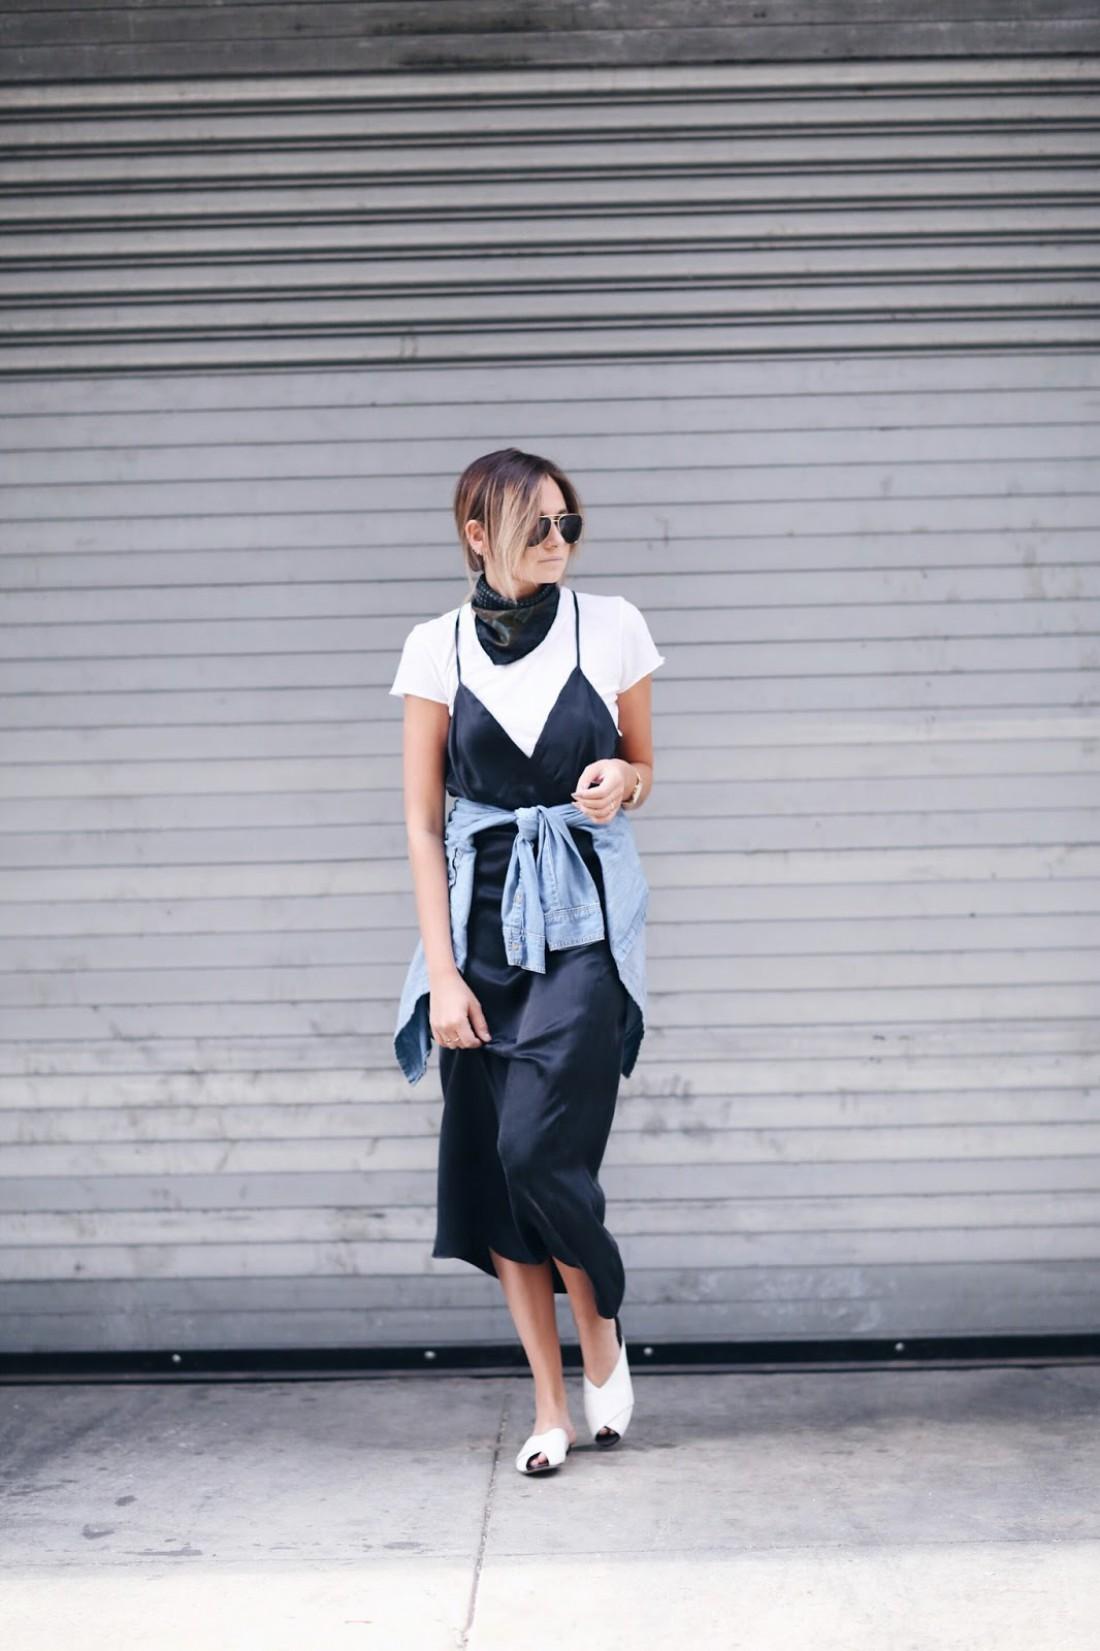 Модный блогер Даниель Бернштейн